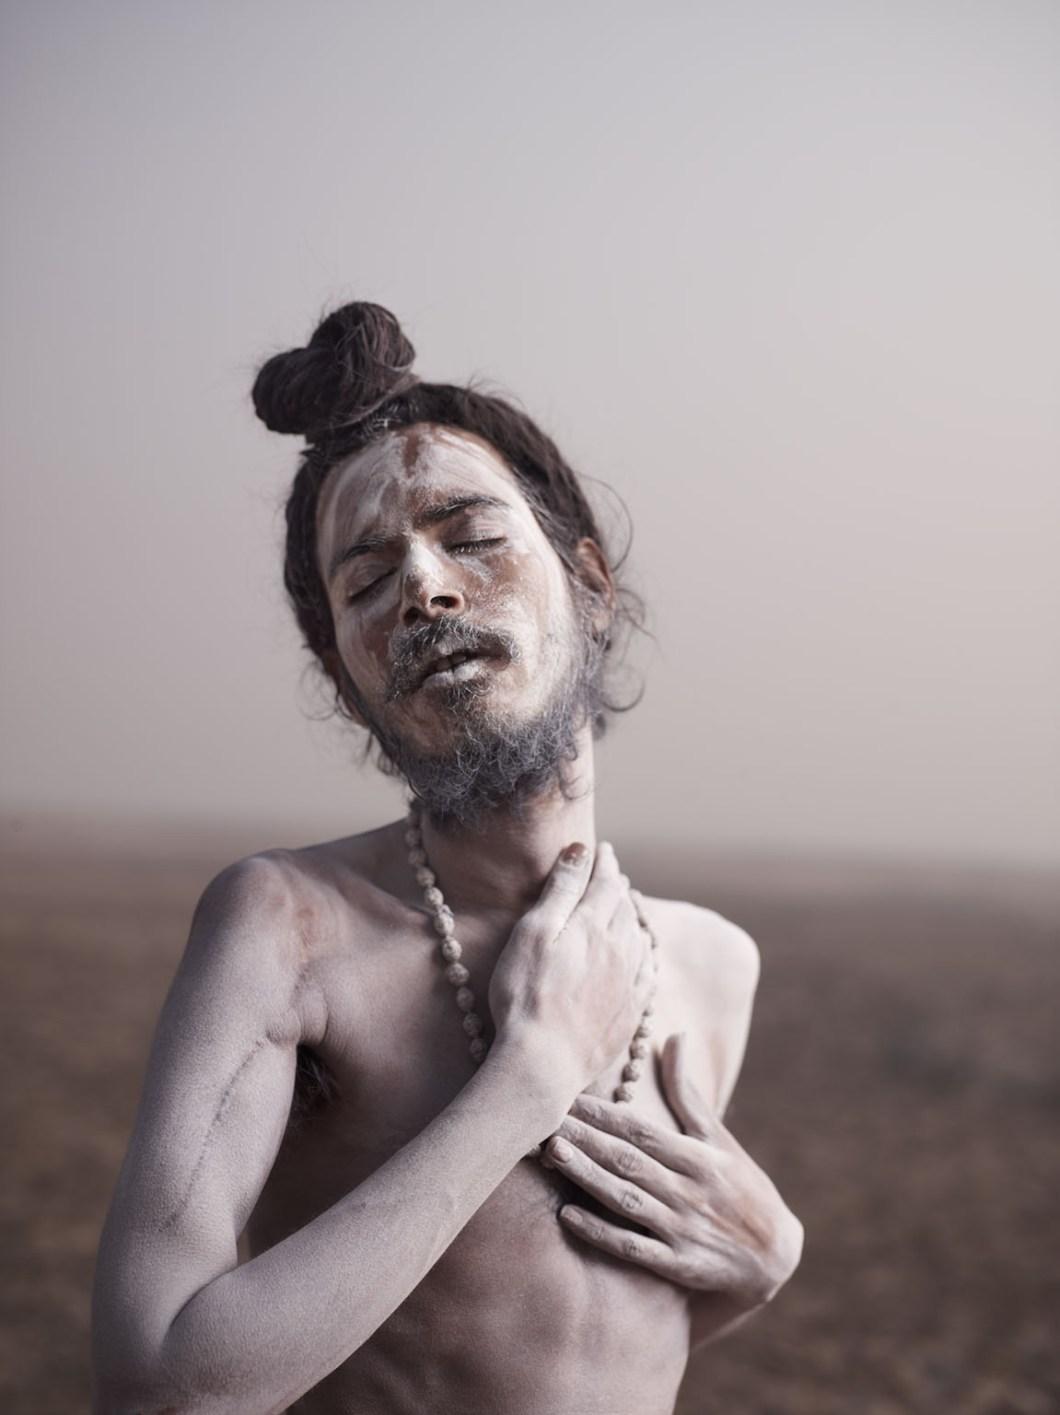 Necrophilia Ritual of Aghori Sadhus in Himalayas